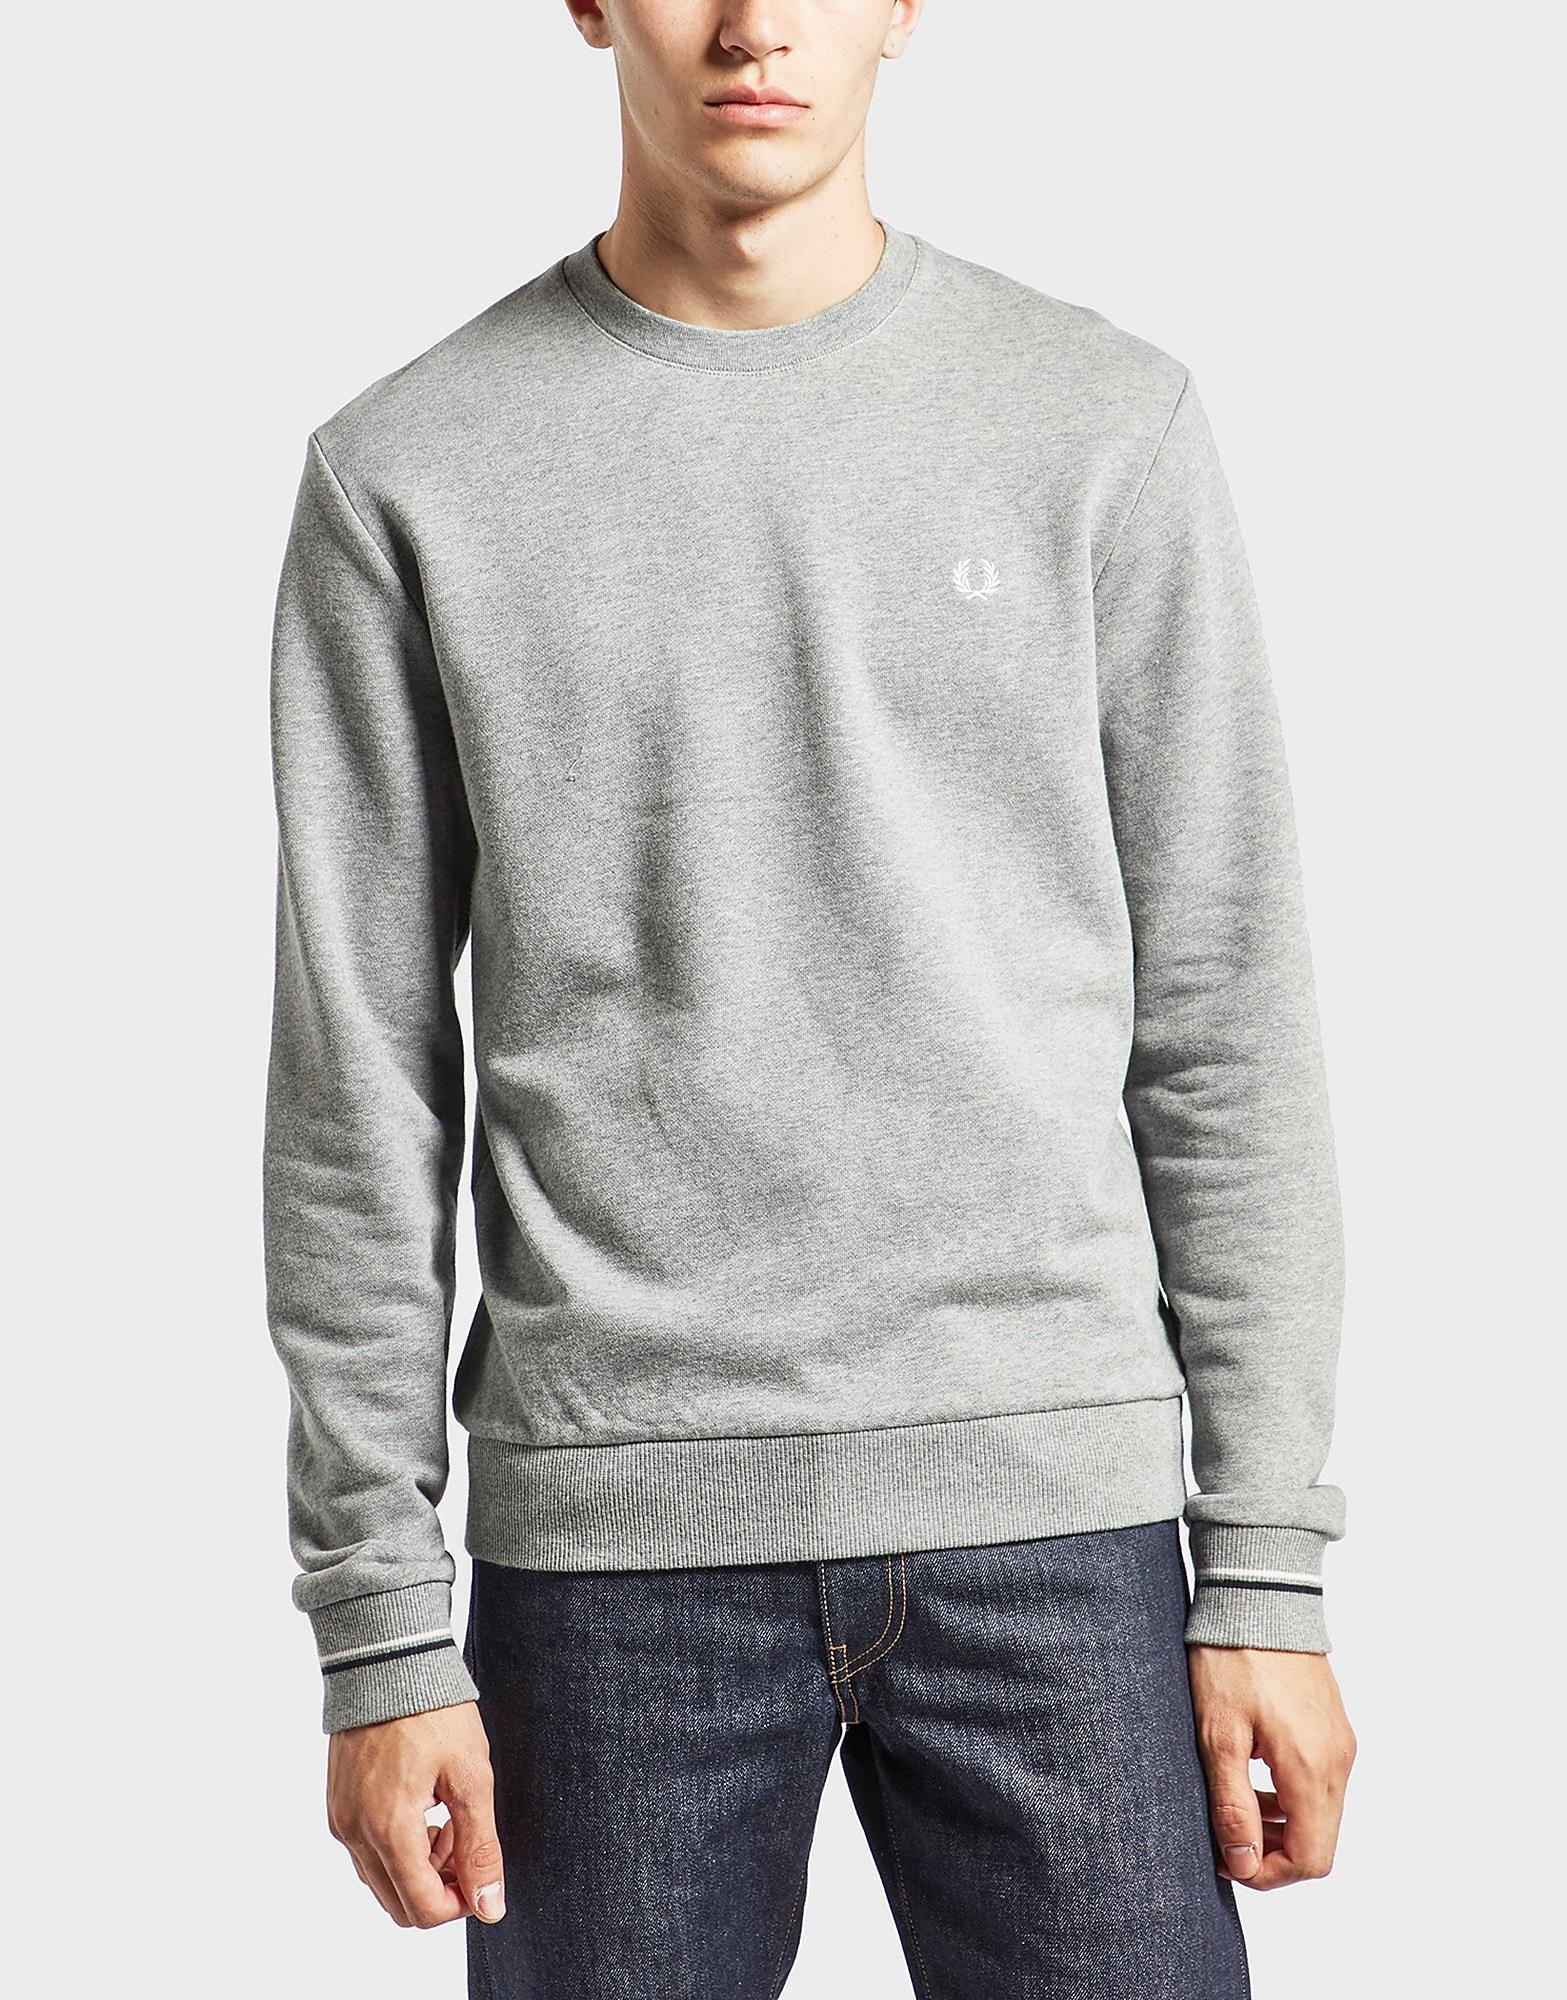 Fred Perry Crew Sweatshirt